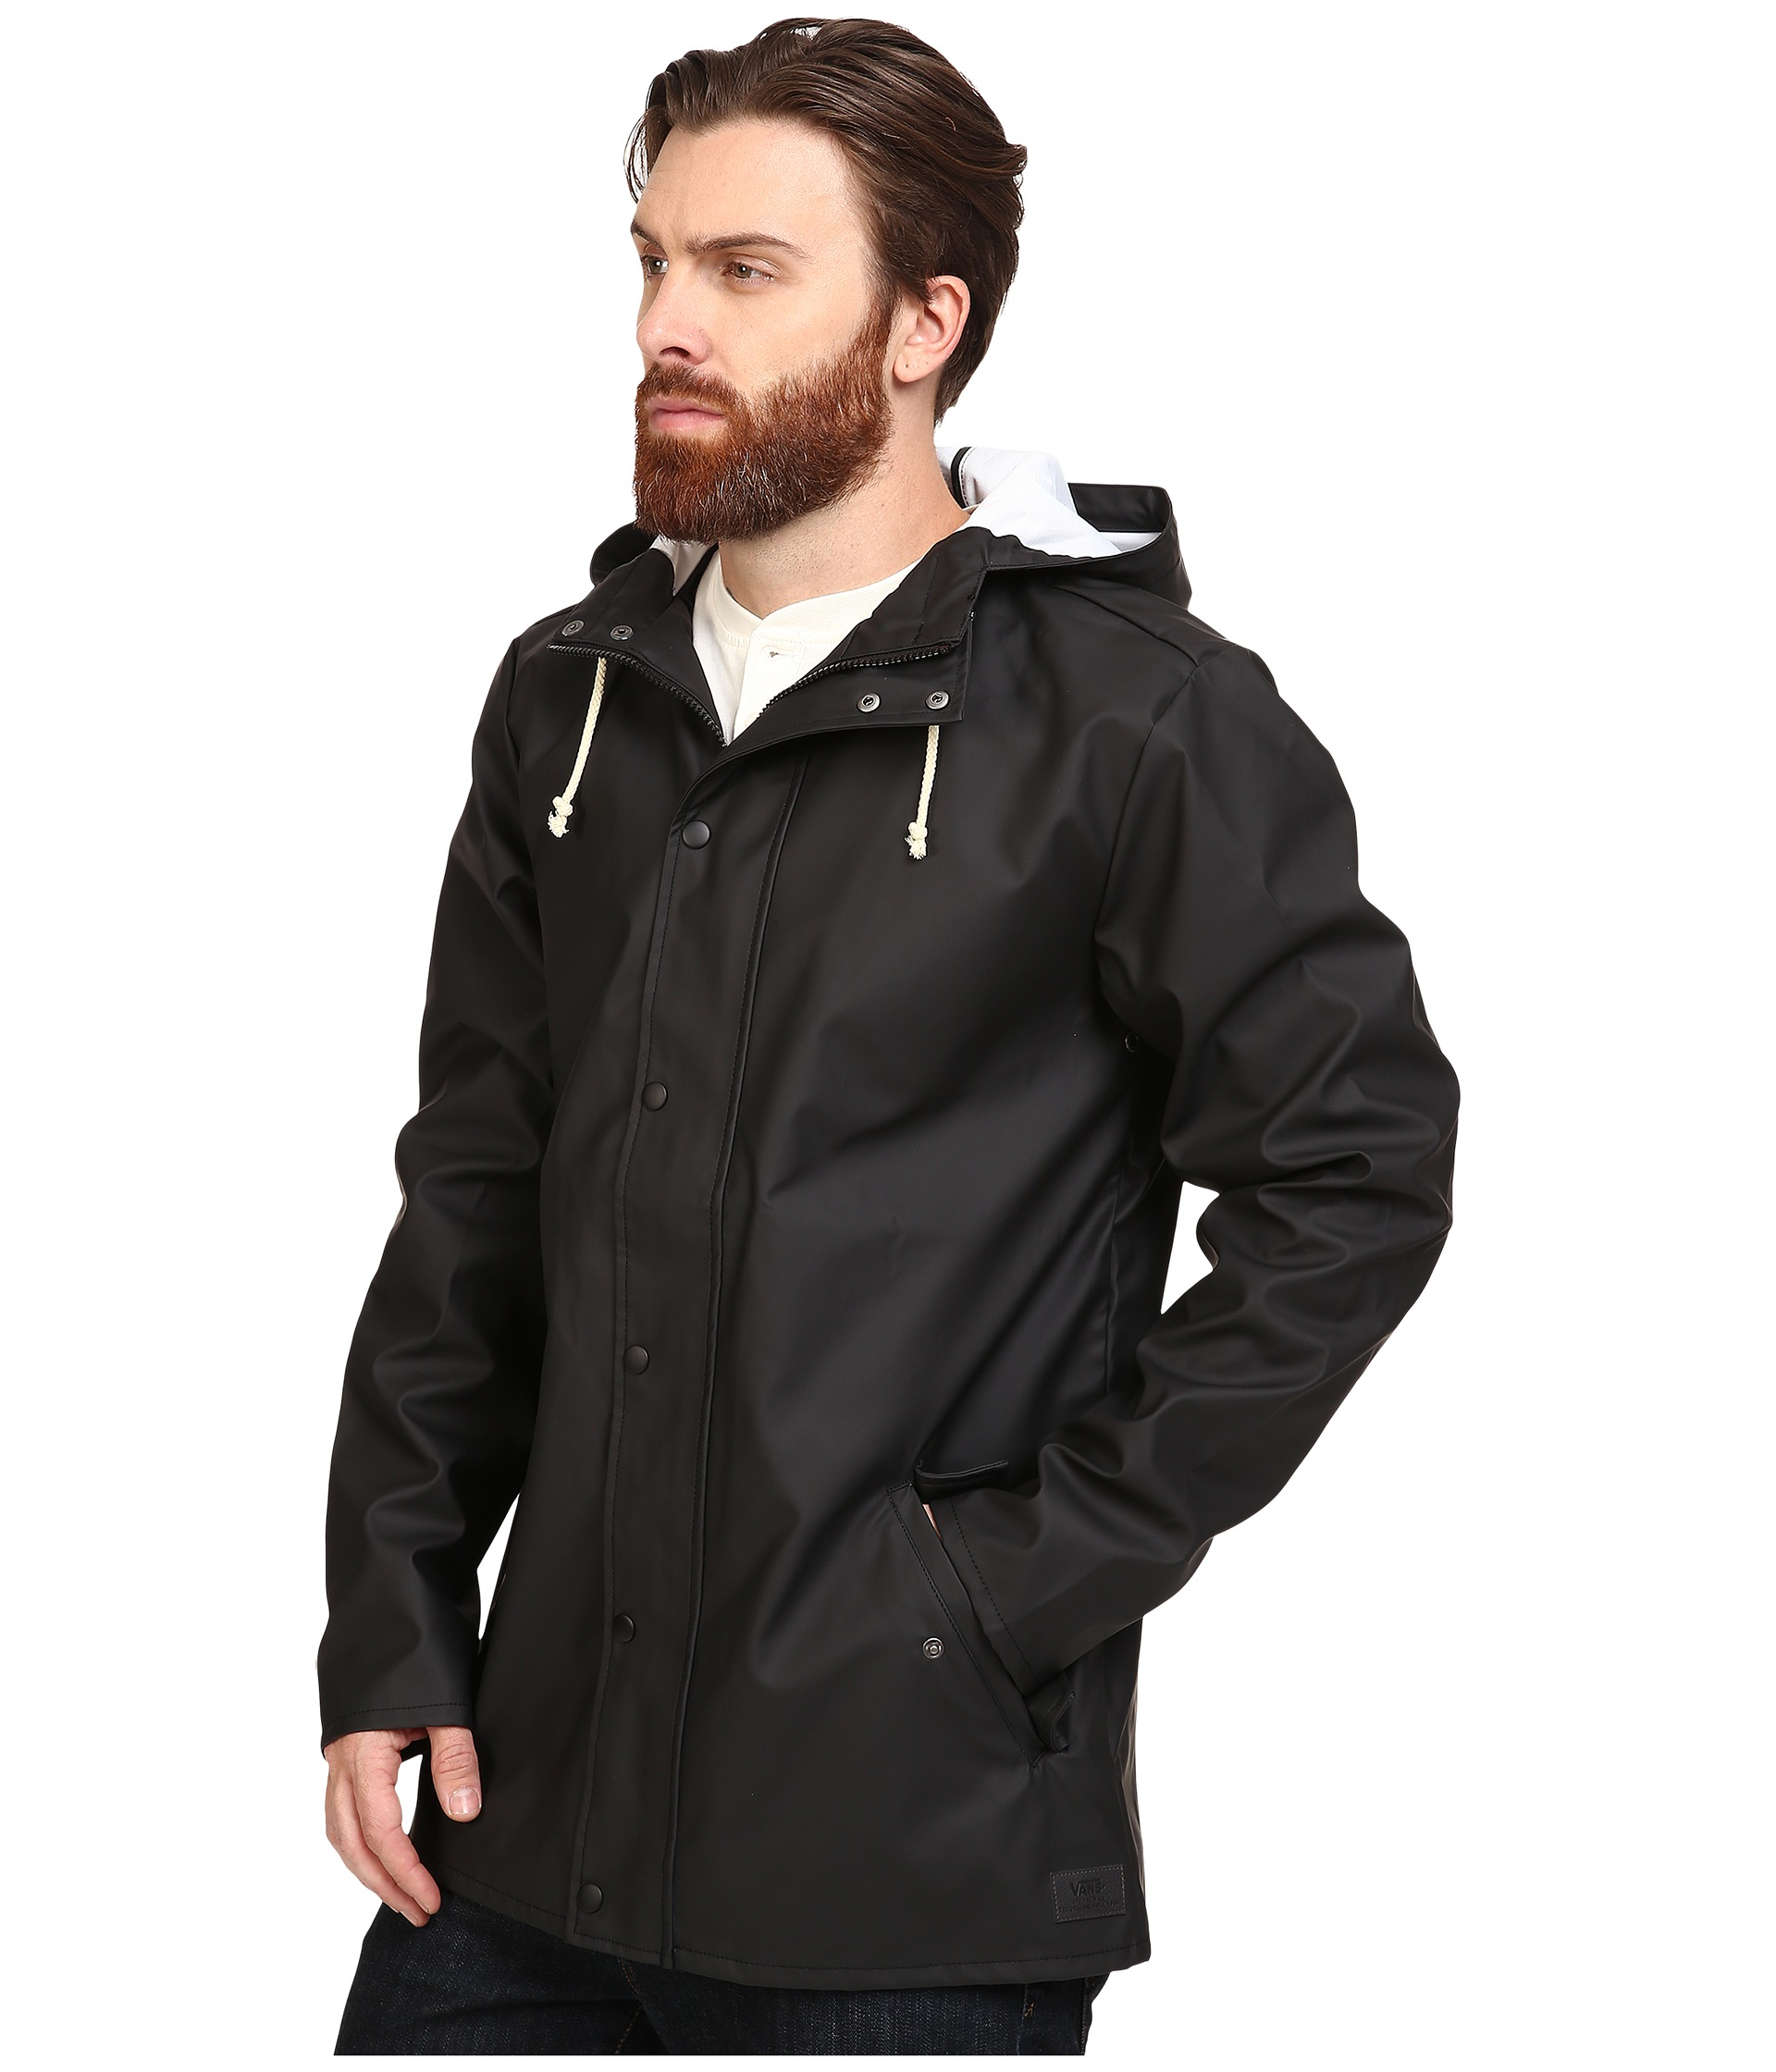 3592647dbe Lyst - Vans Junipero Moutain Edition Jacket in Black for Men